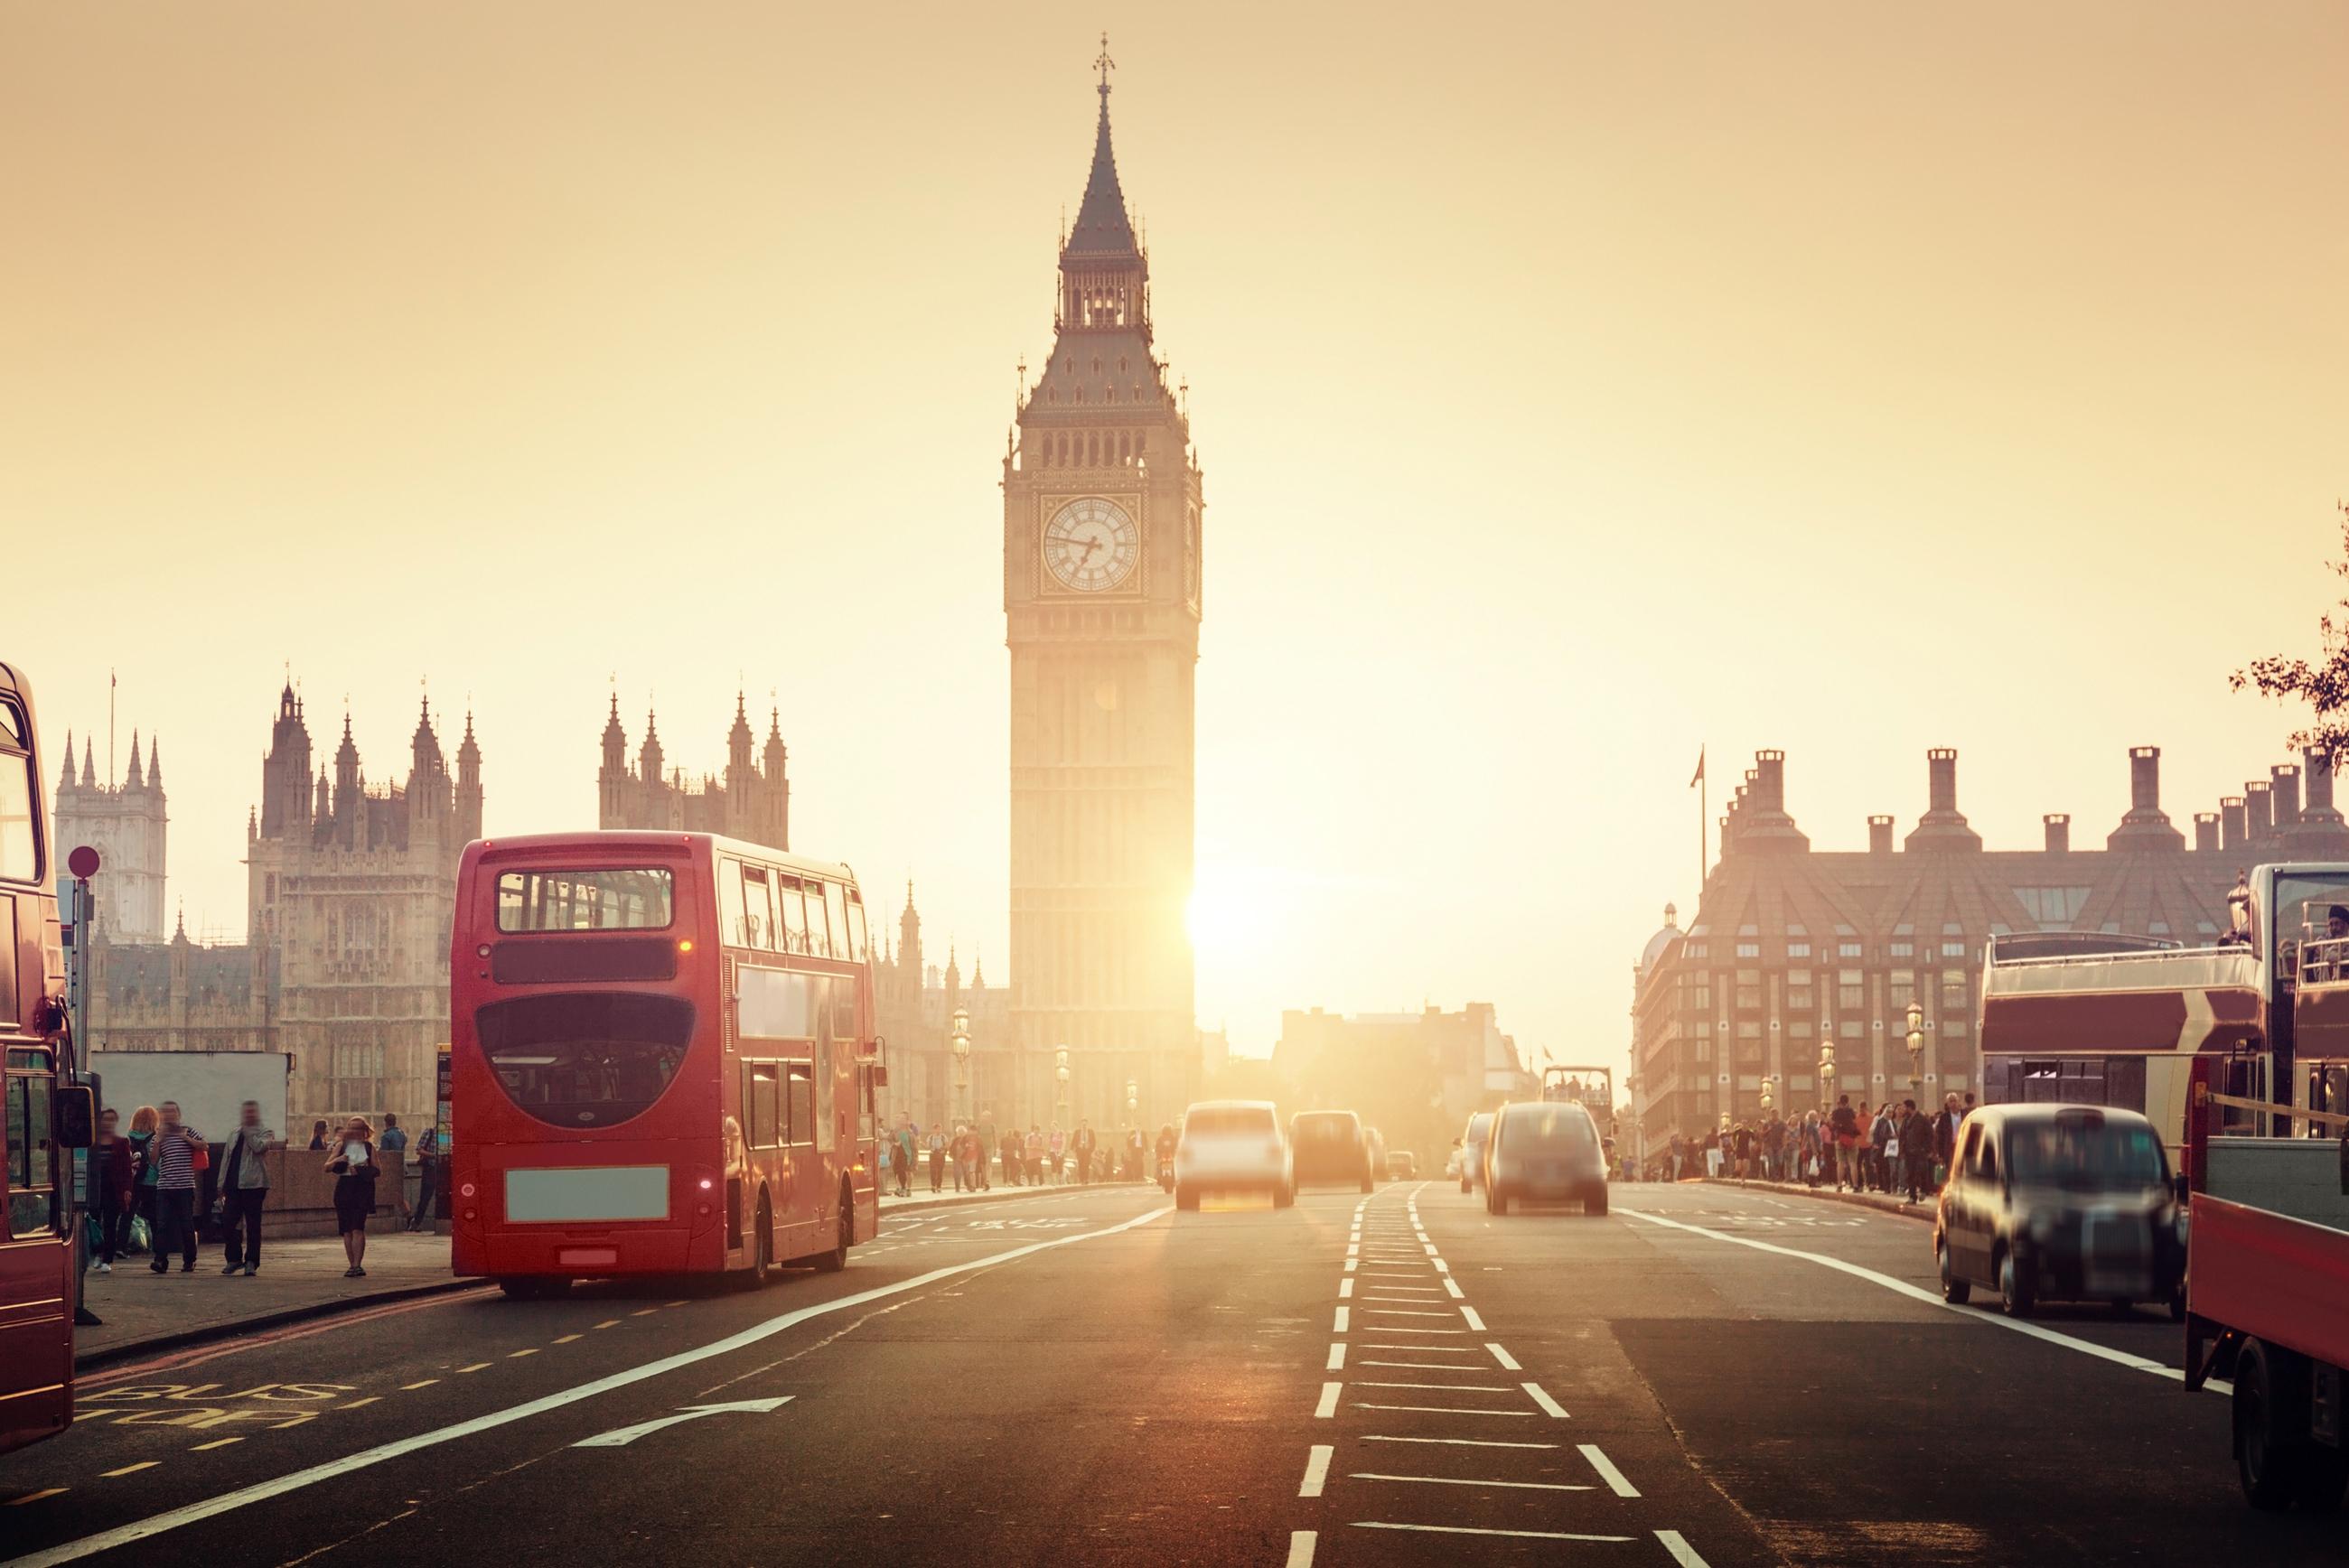 Hacks For International Students In London - London